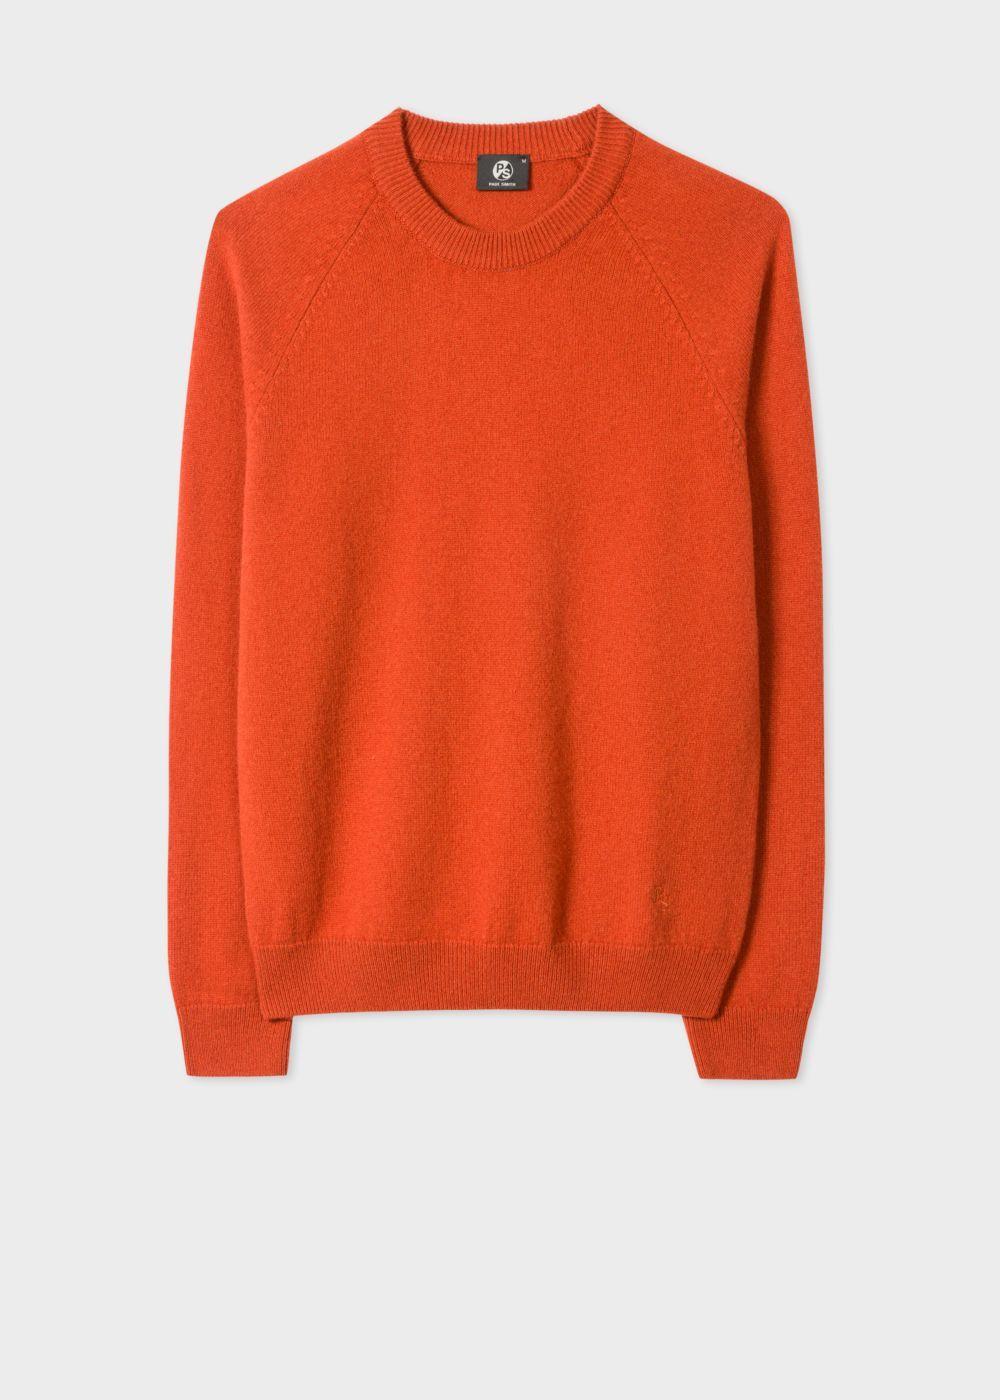 Men S Burnt Orange Merino Wool Raglan Sleeve Sweater Knitwear Men Sweaters Raglan Sleeve Sweater [ 1400 x 1000 Pixel ]